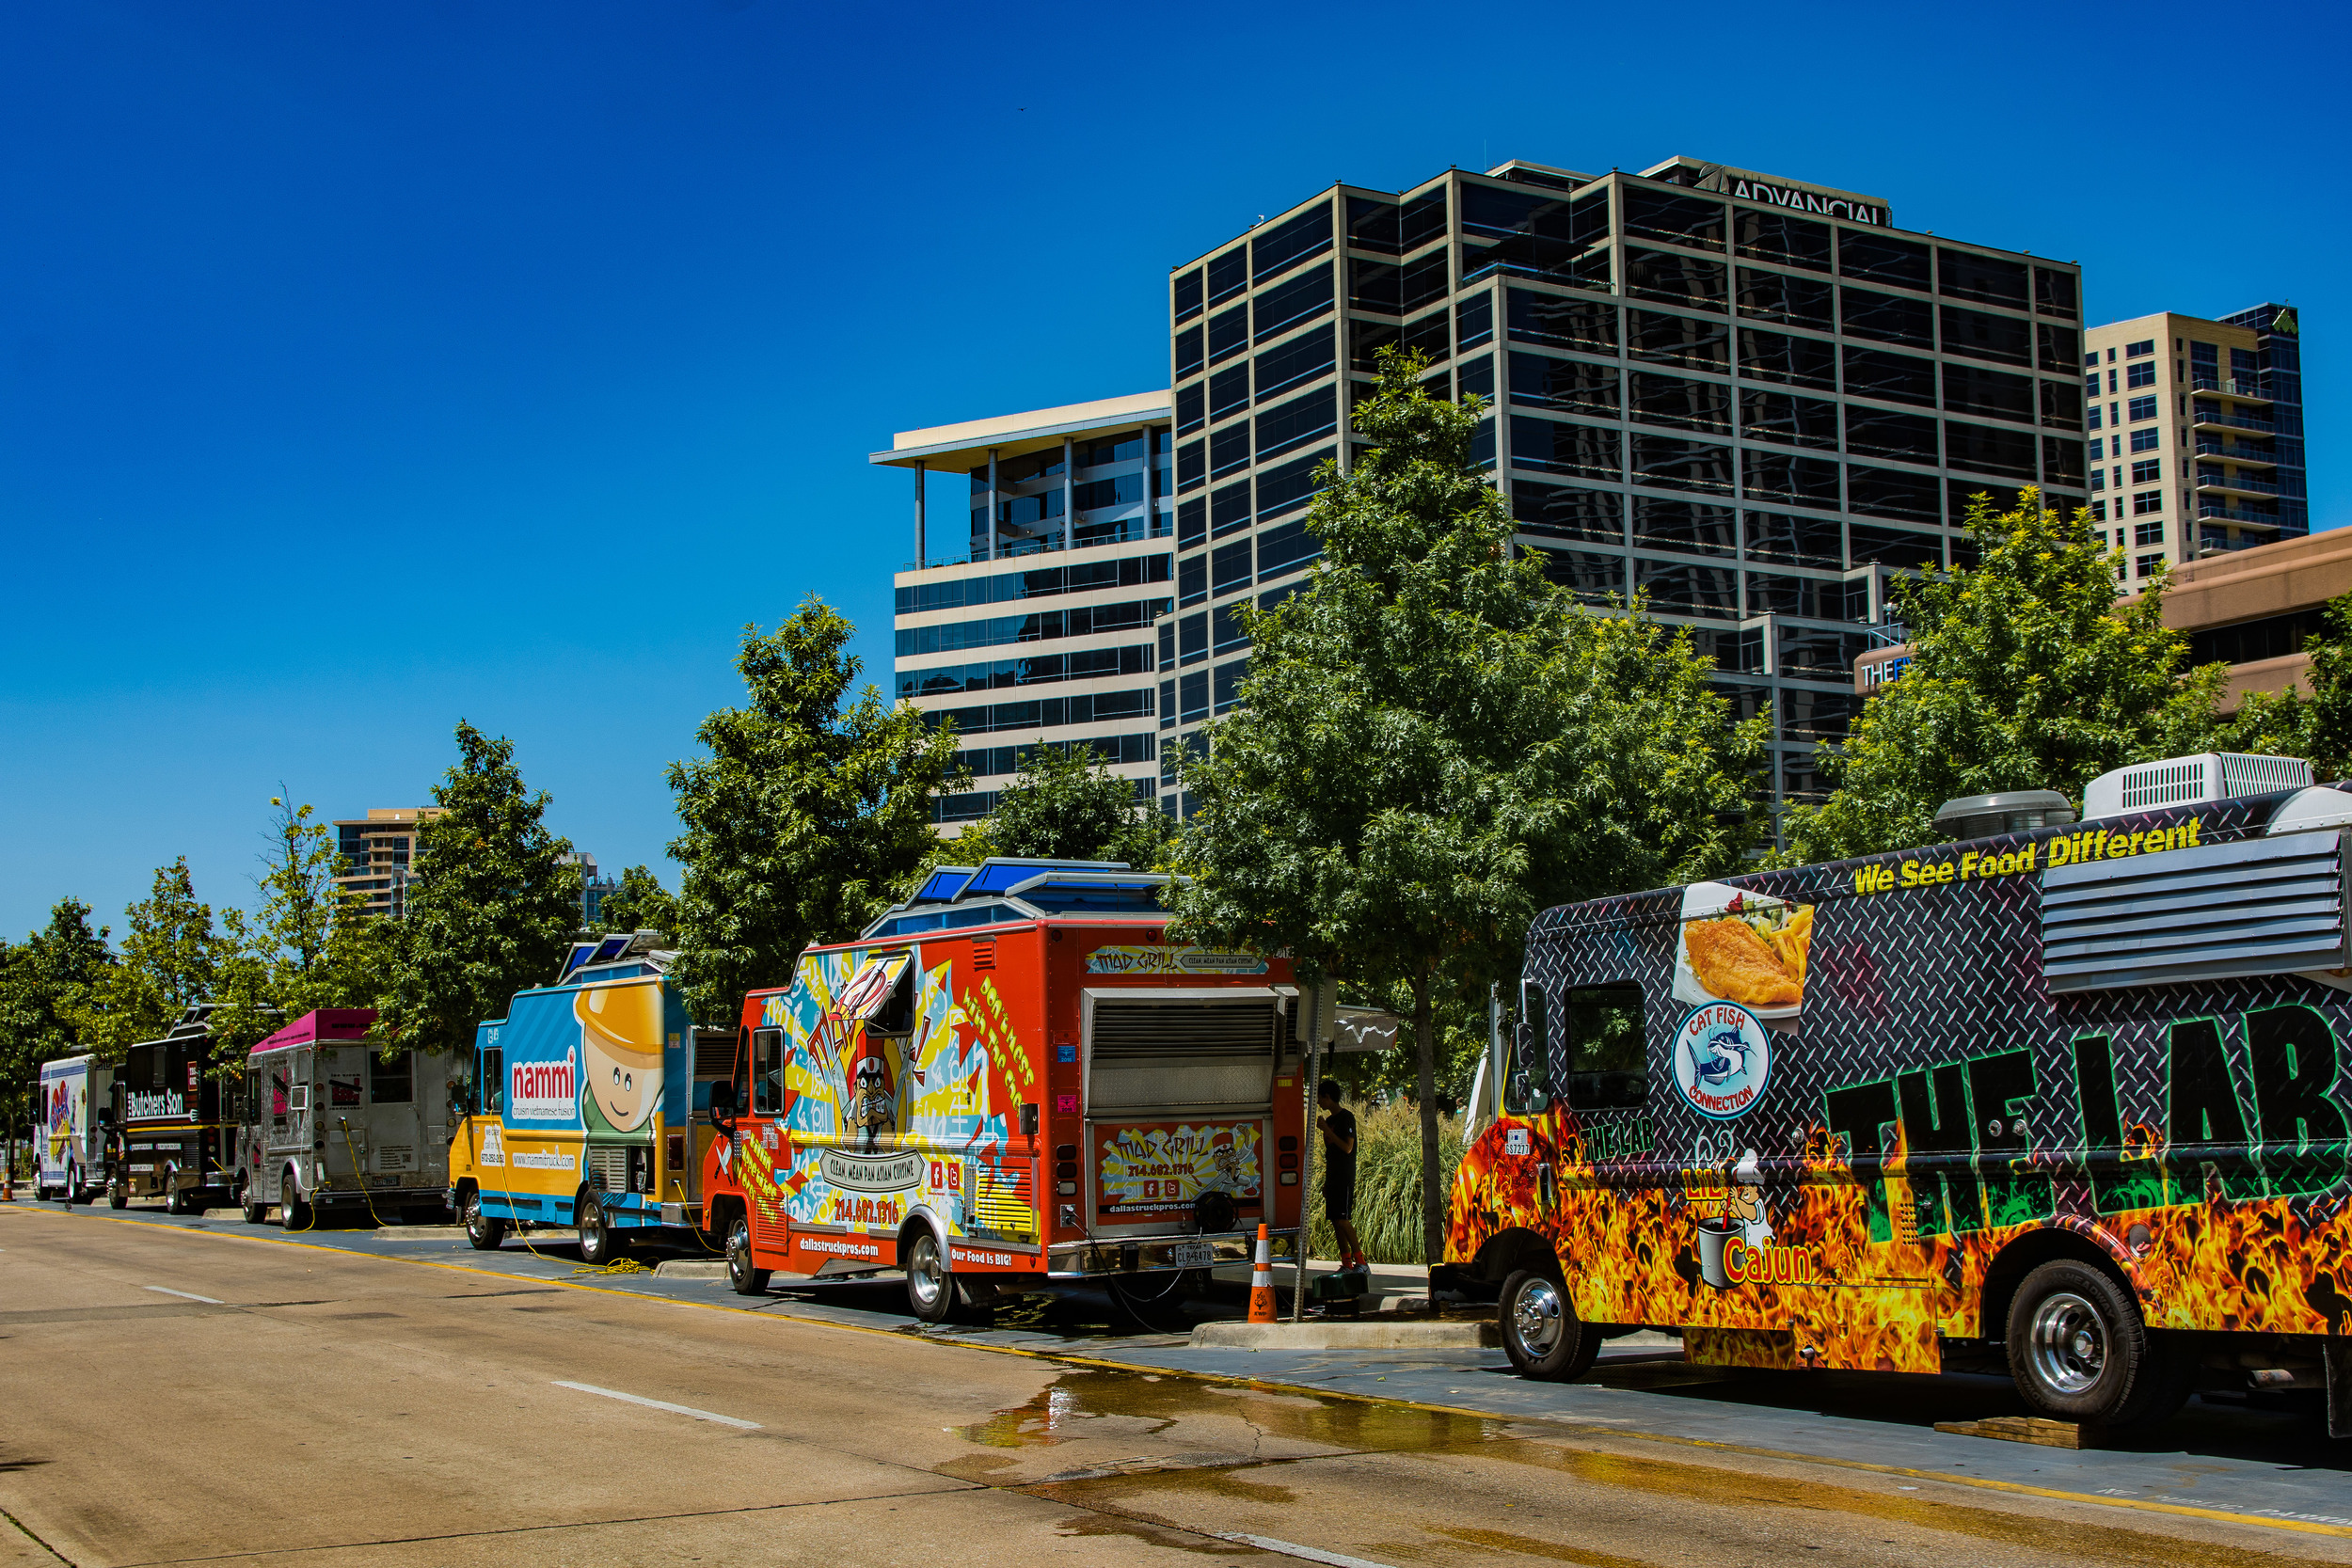 Nifty food trucks in Big D.